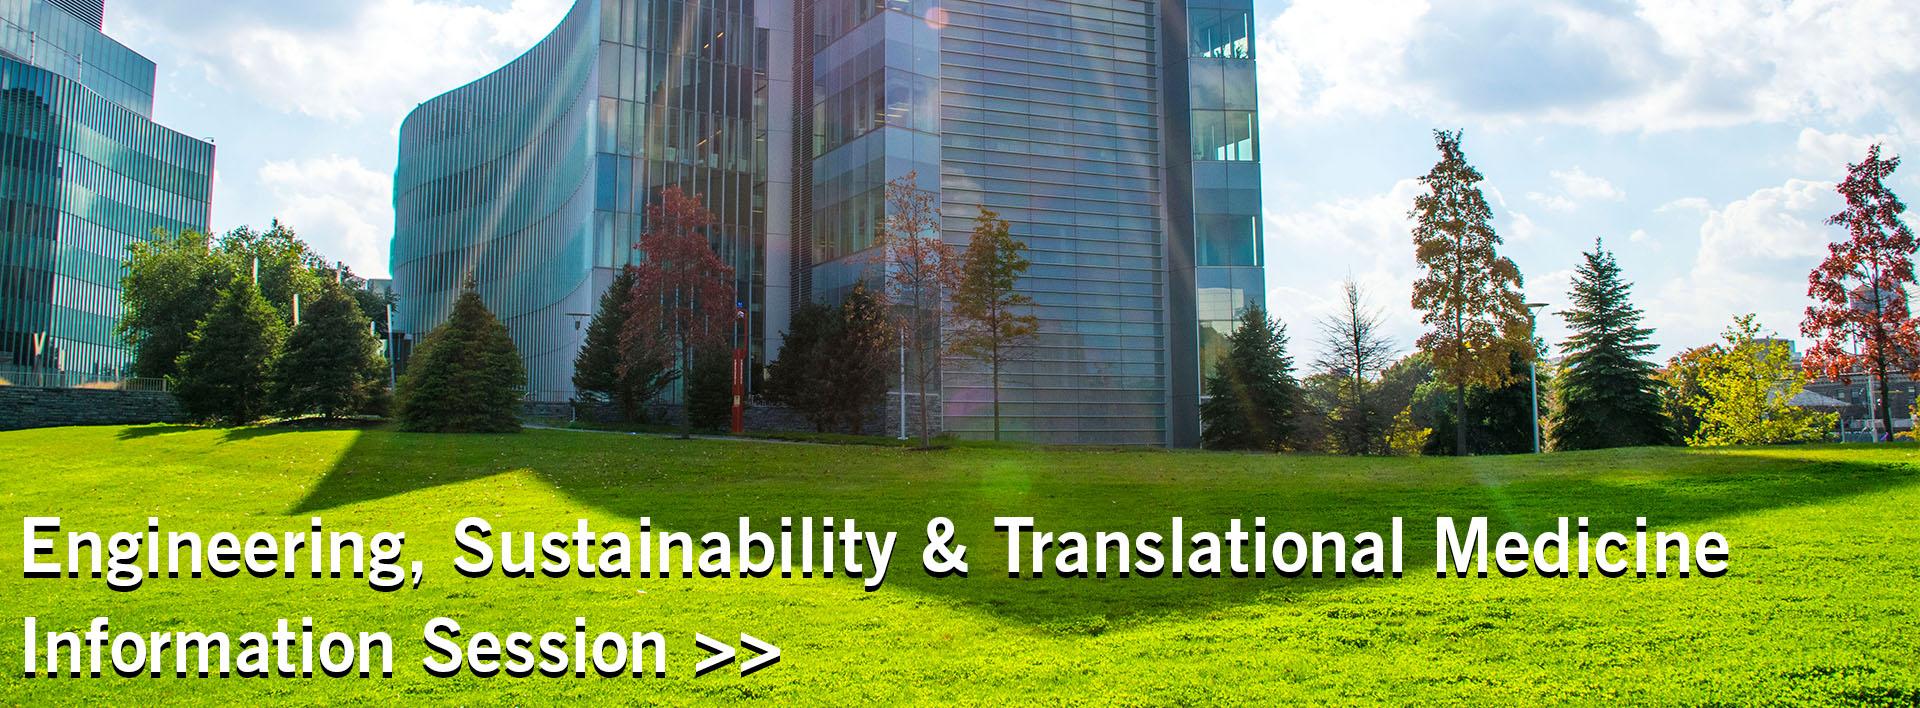 Engineering, Sustainability & translational medicine information session sustainer banner